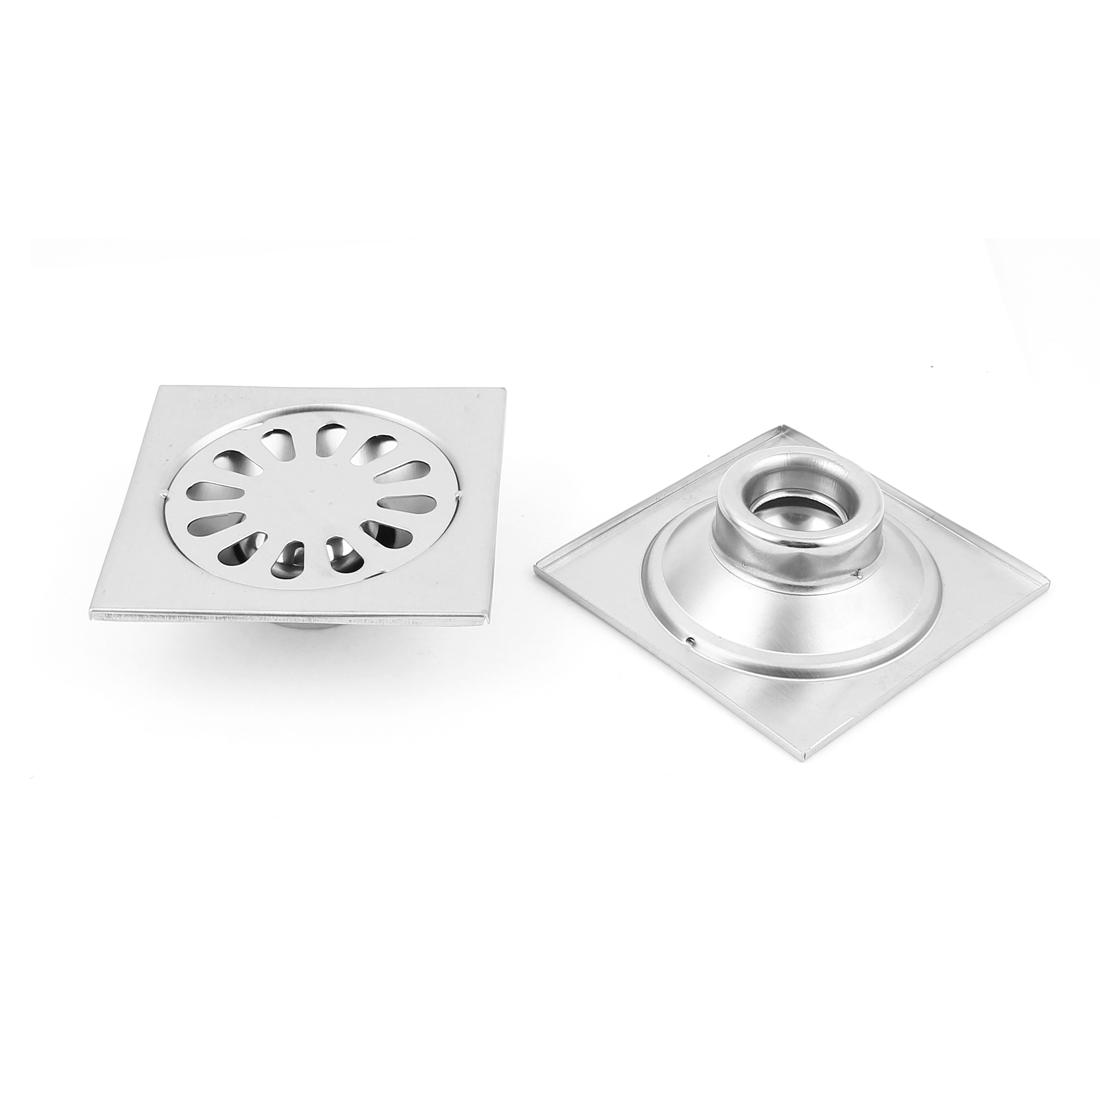 Kitchen Bathroom Shower Stainless Steel Square Shape Sink Floor Drain Filter Stopper Grate Strainer 2pcs